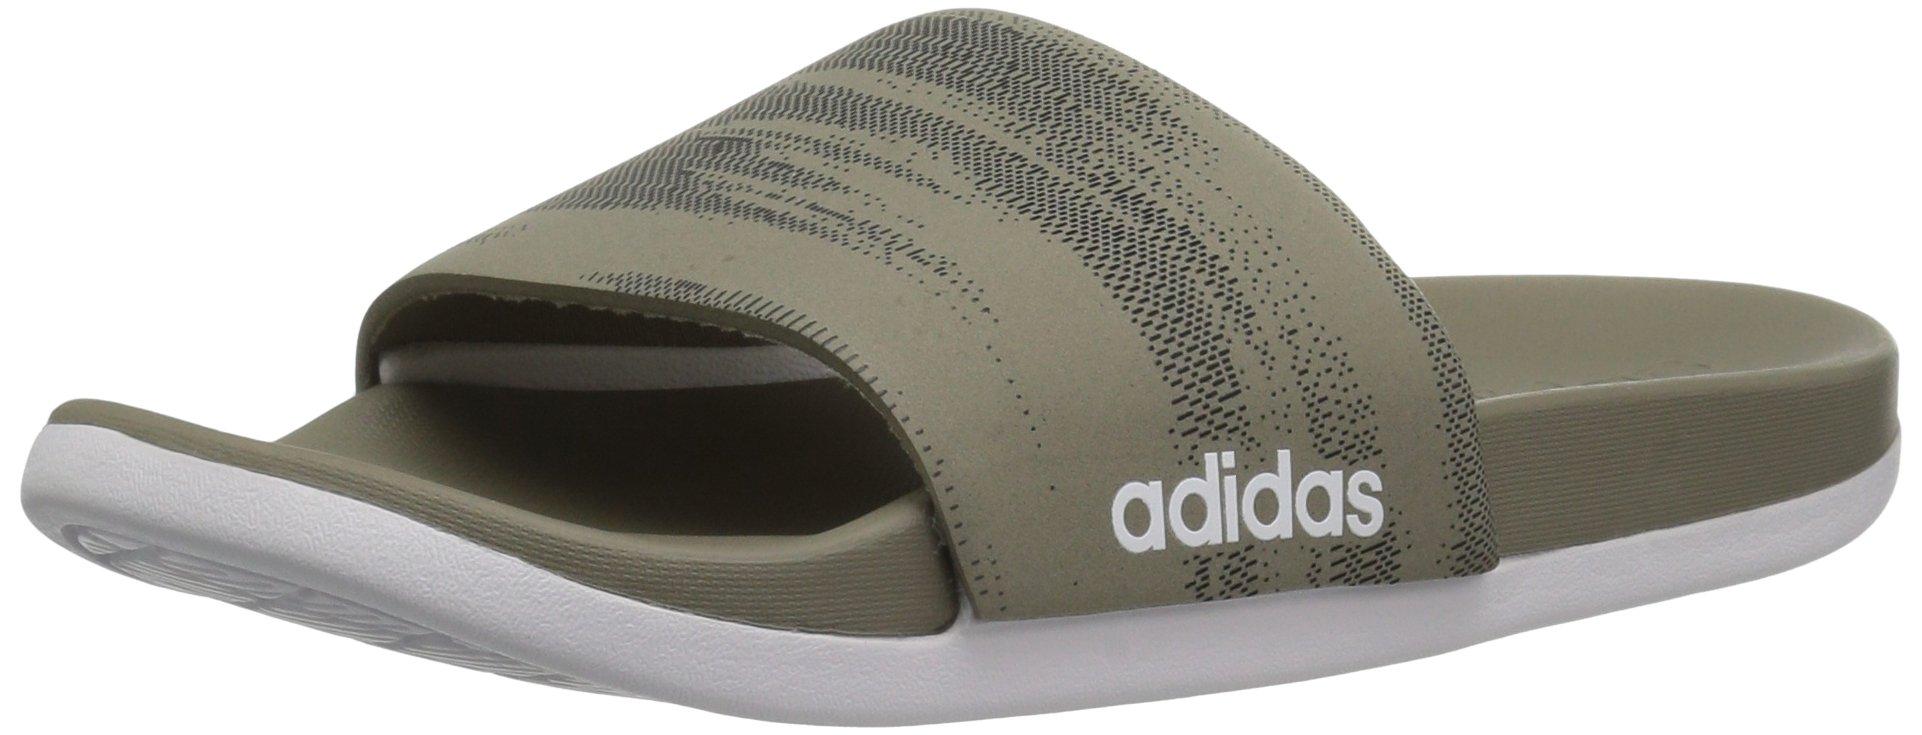 81c9f3df2b27 Get Quotations · adidas Men s Adilette Cf+ Link Gr Slide Sandal